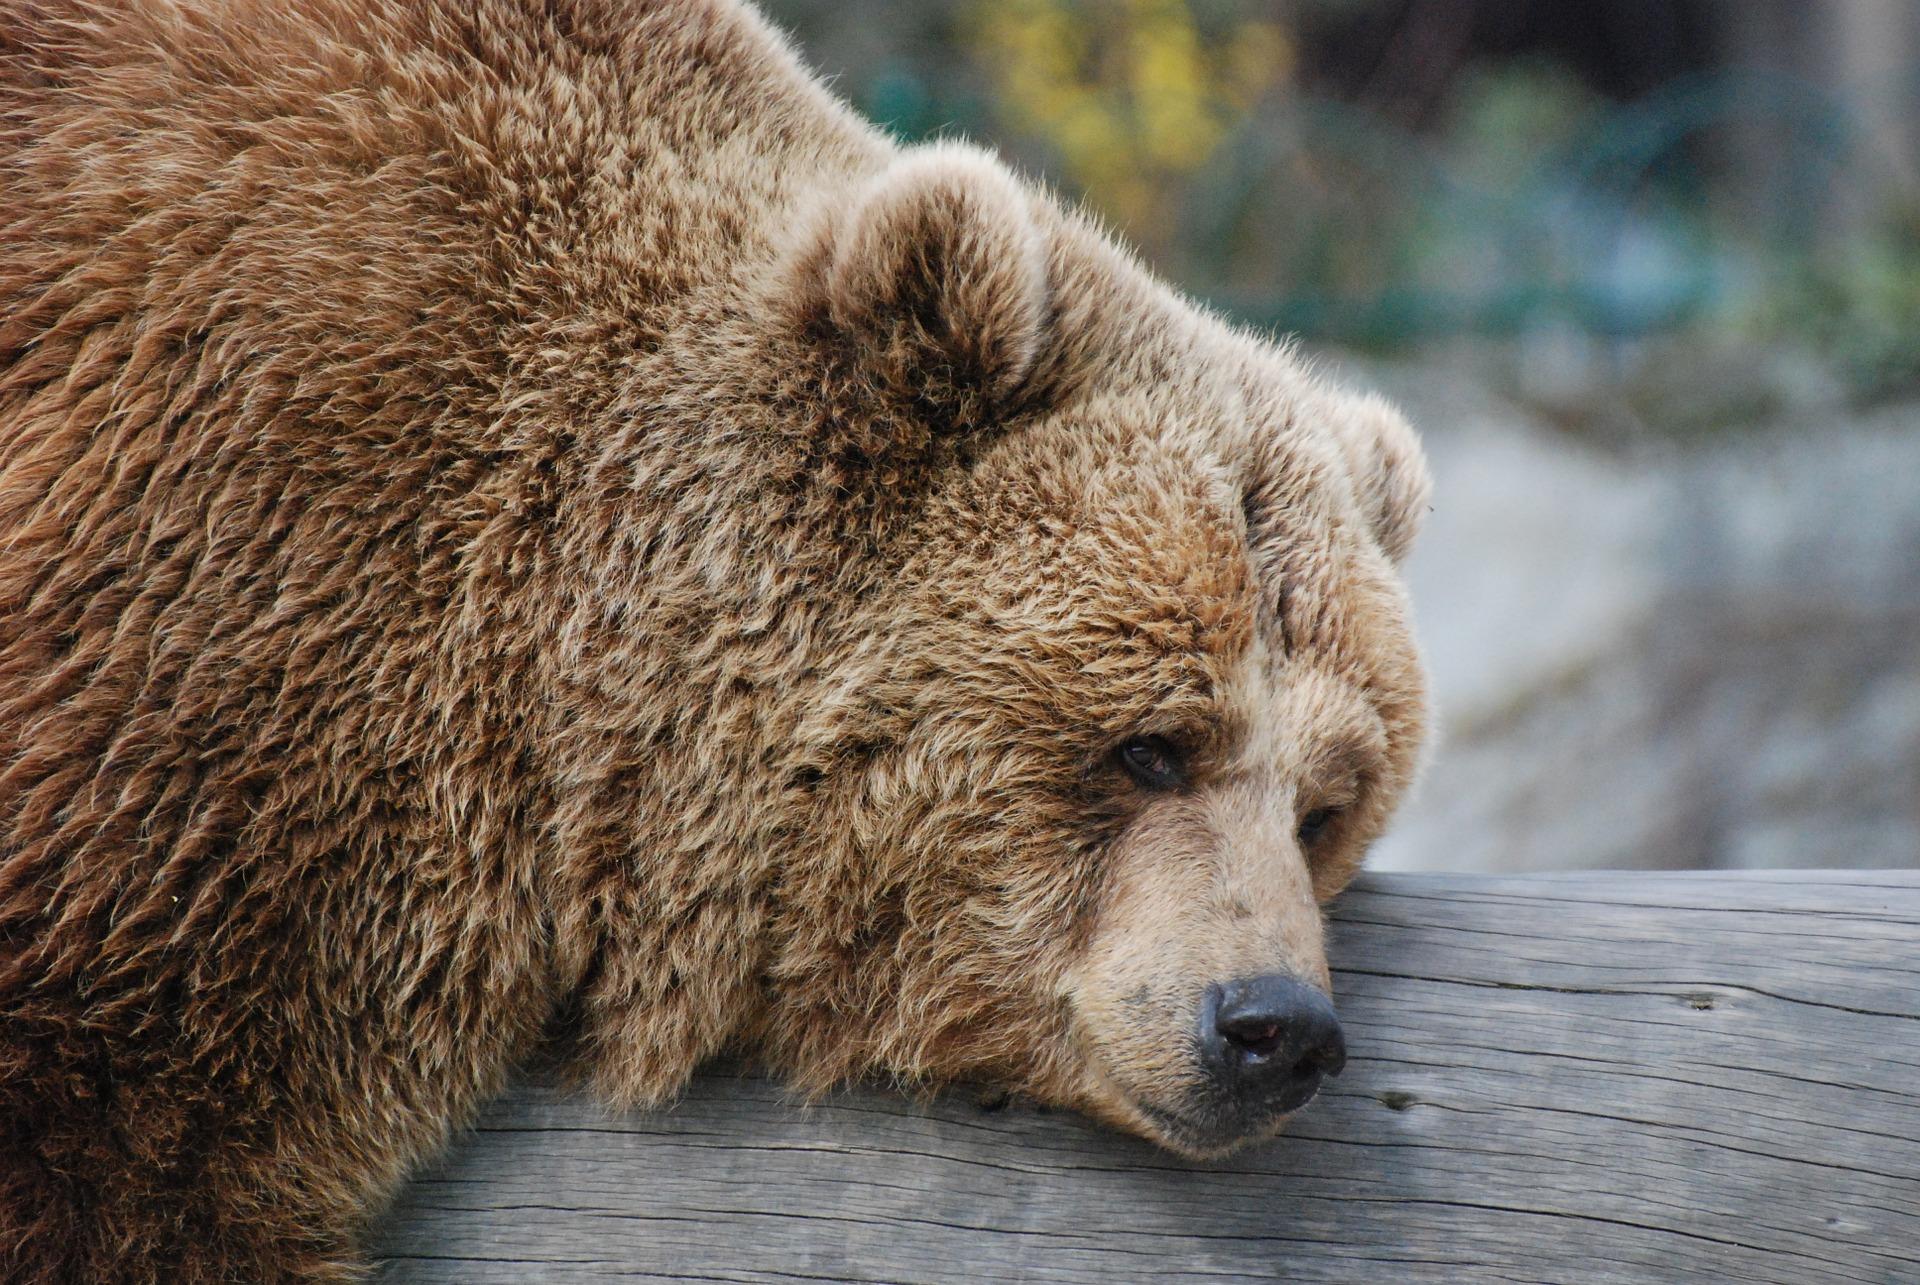 bear-711061_1920_pixabay